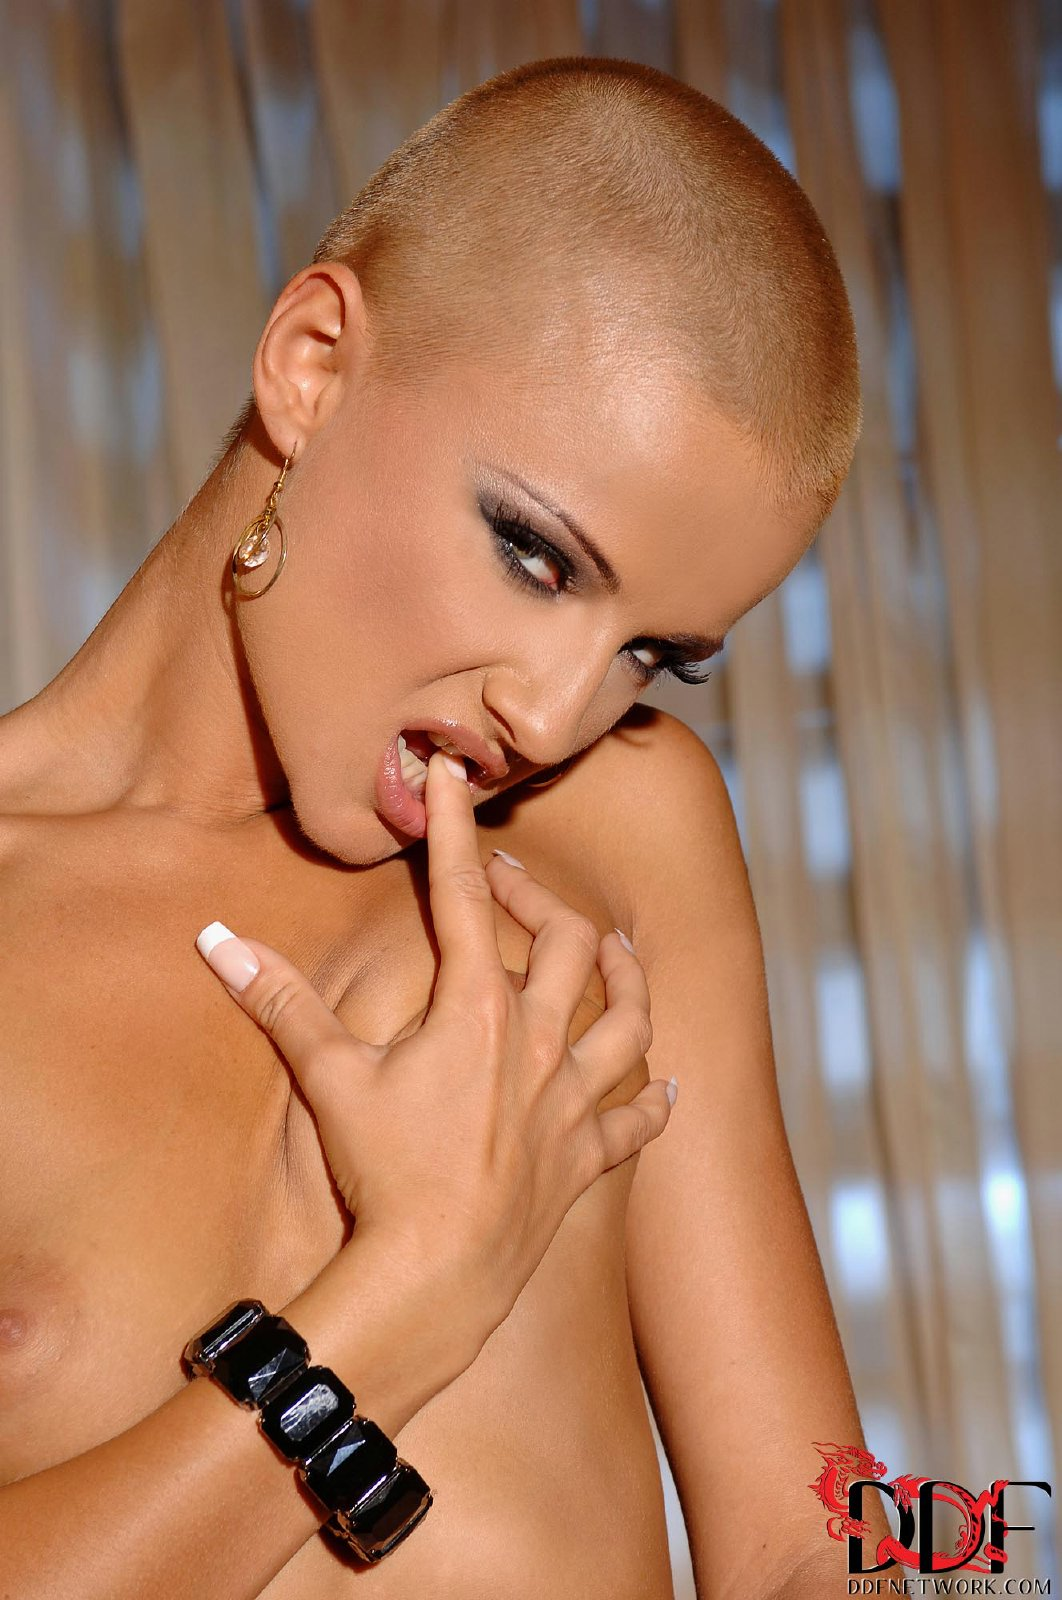 Bald pornstars